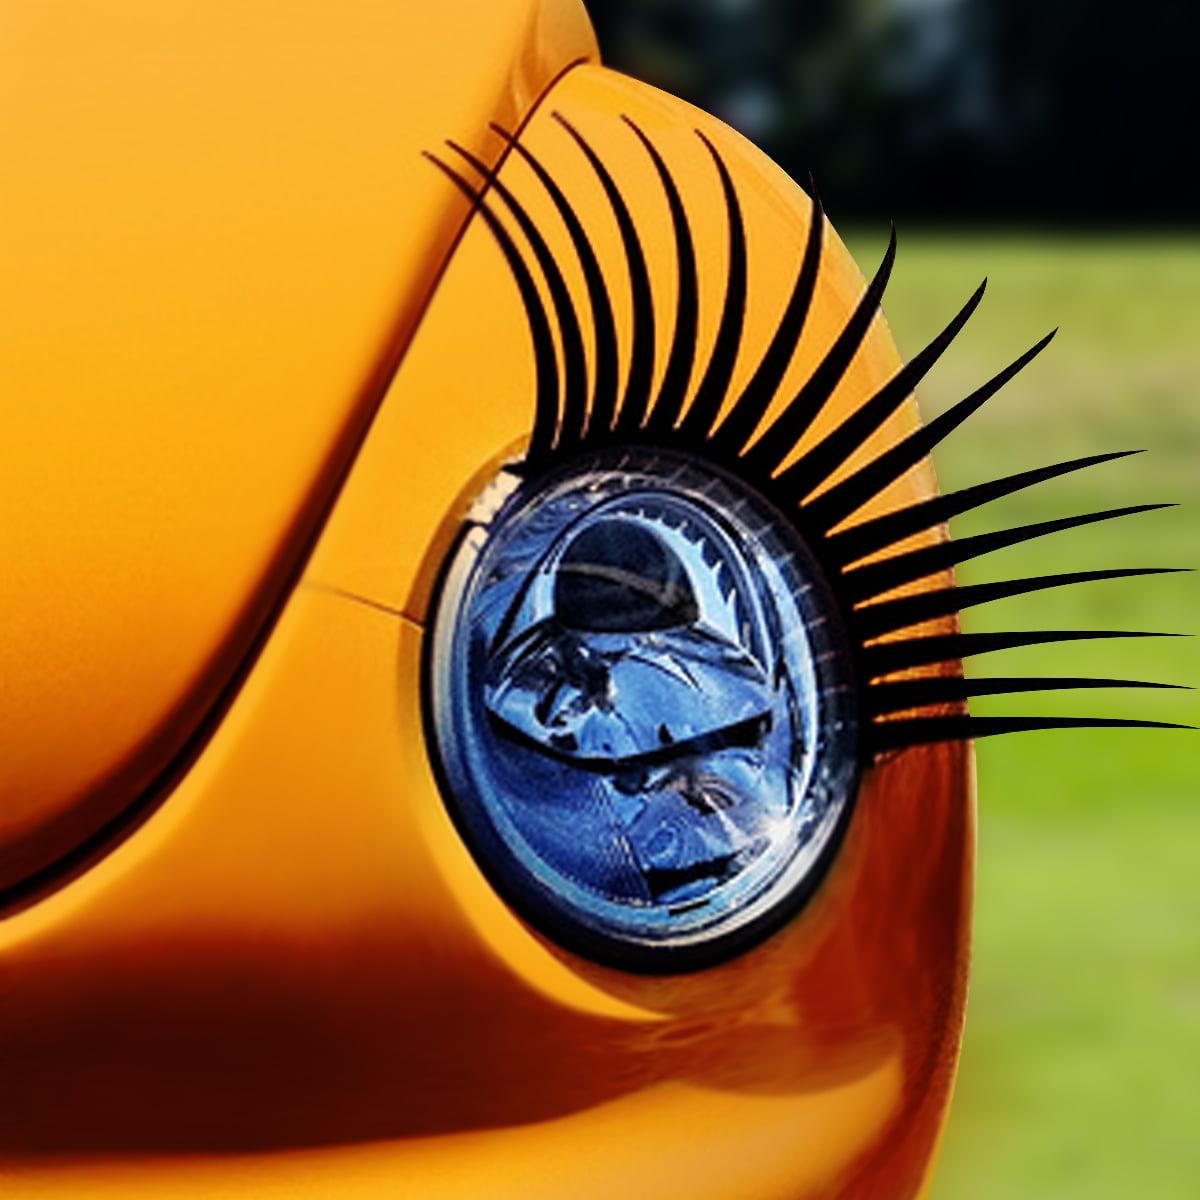 Automotive headlamp car eyelash decals